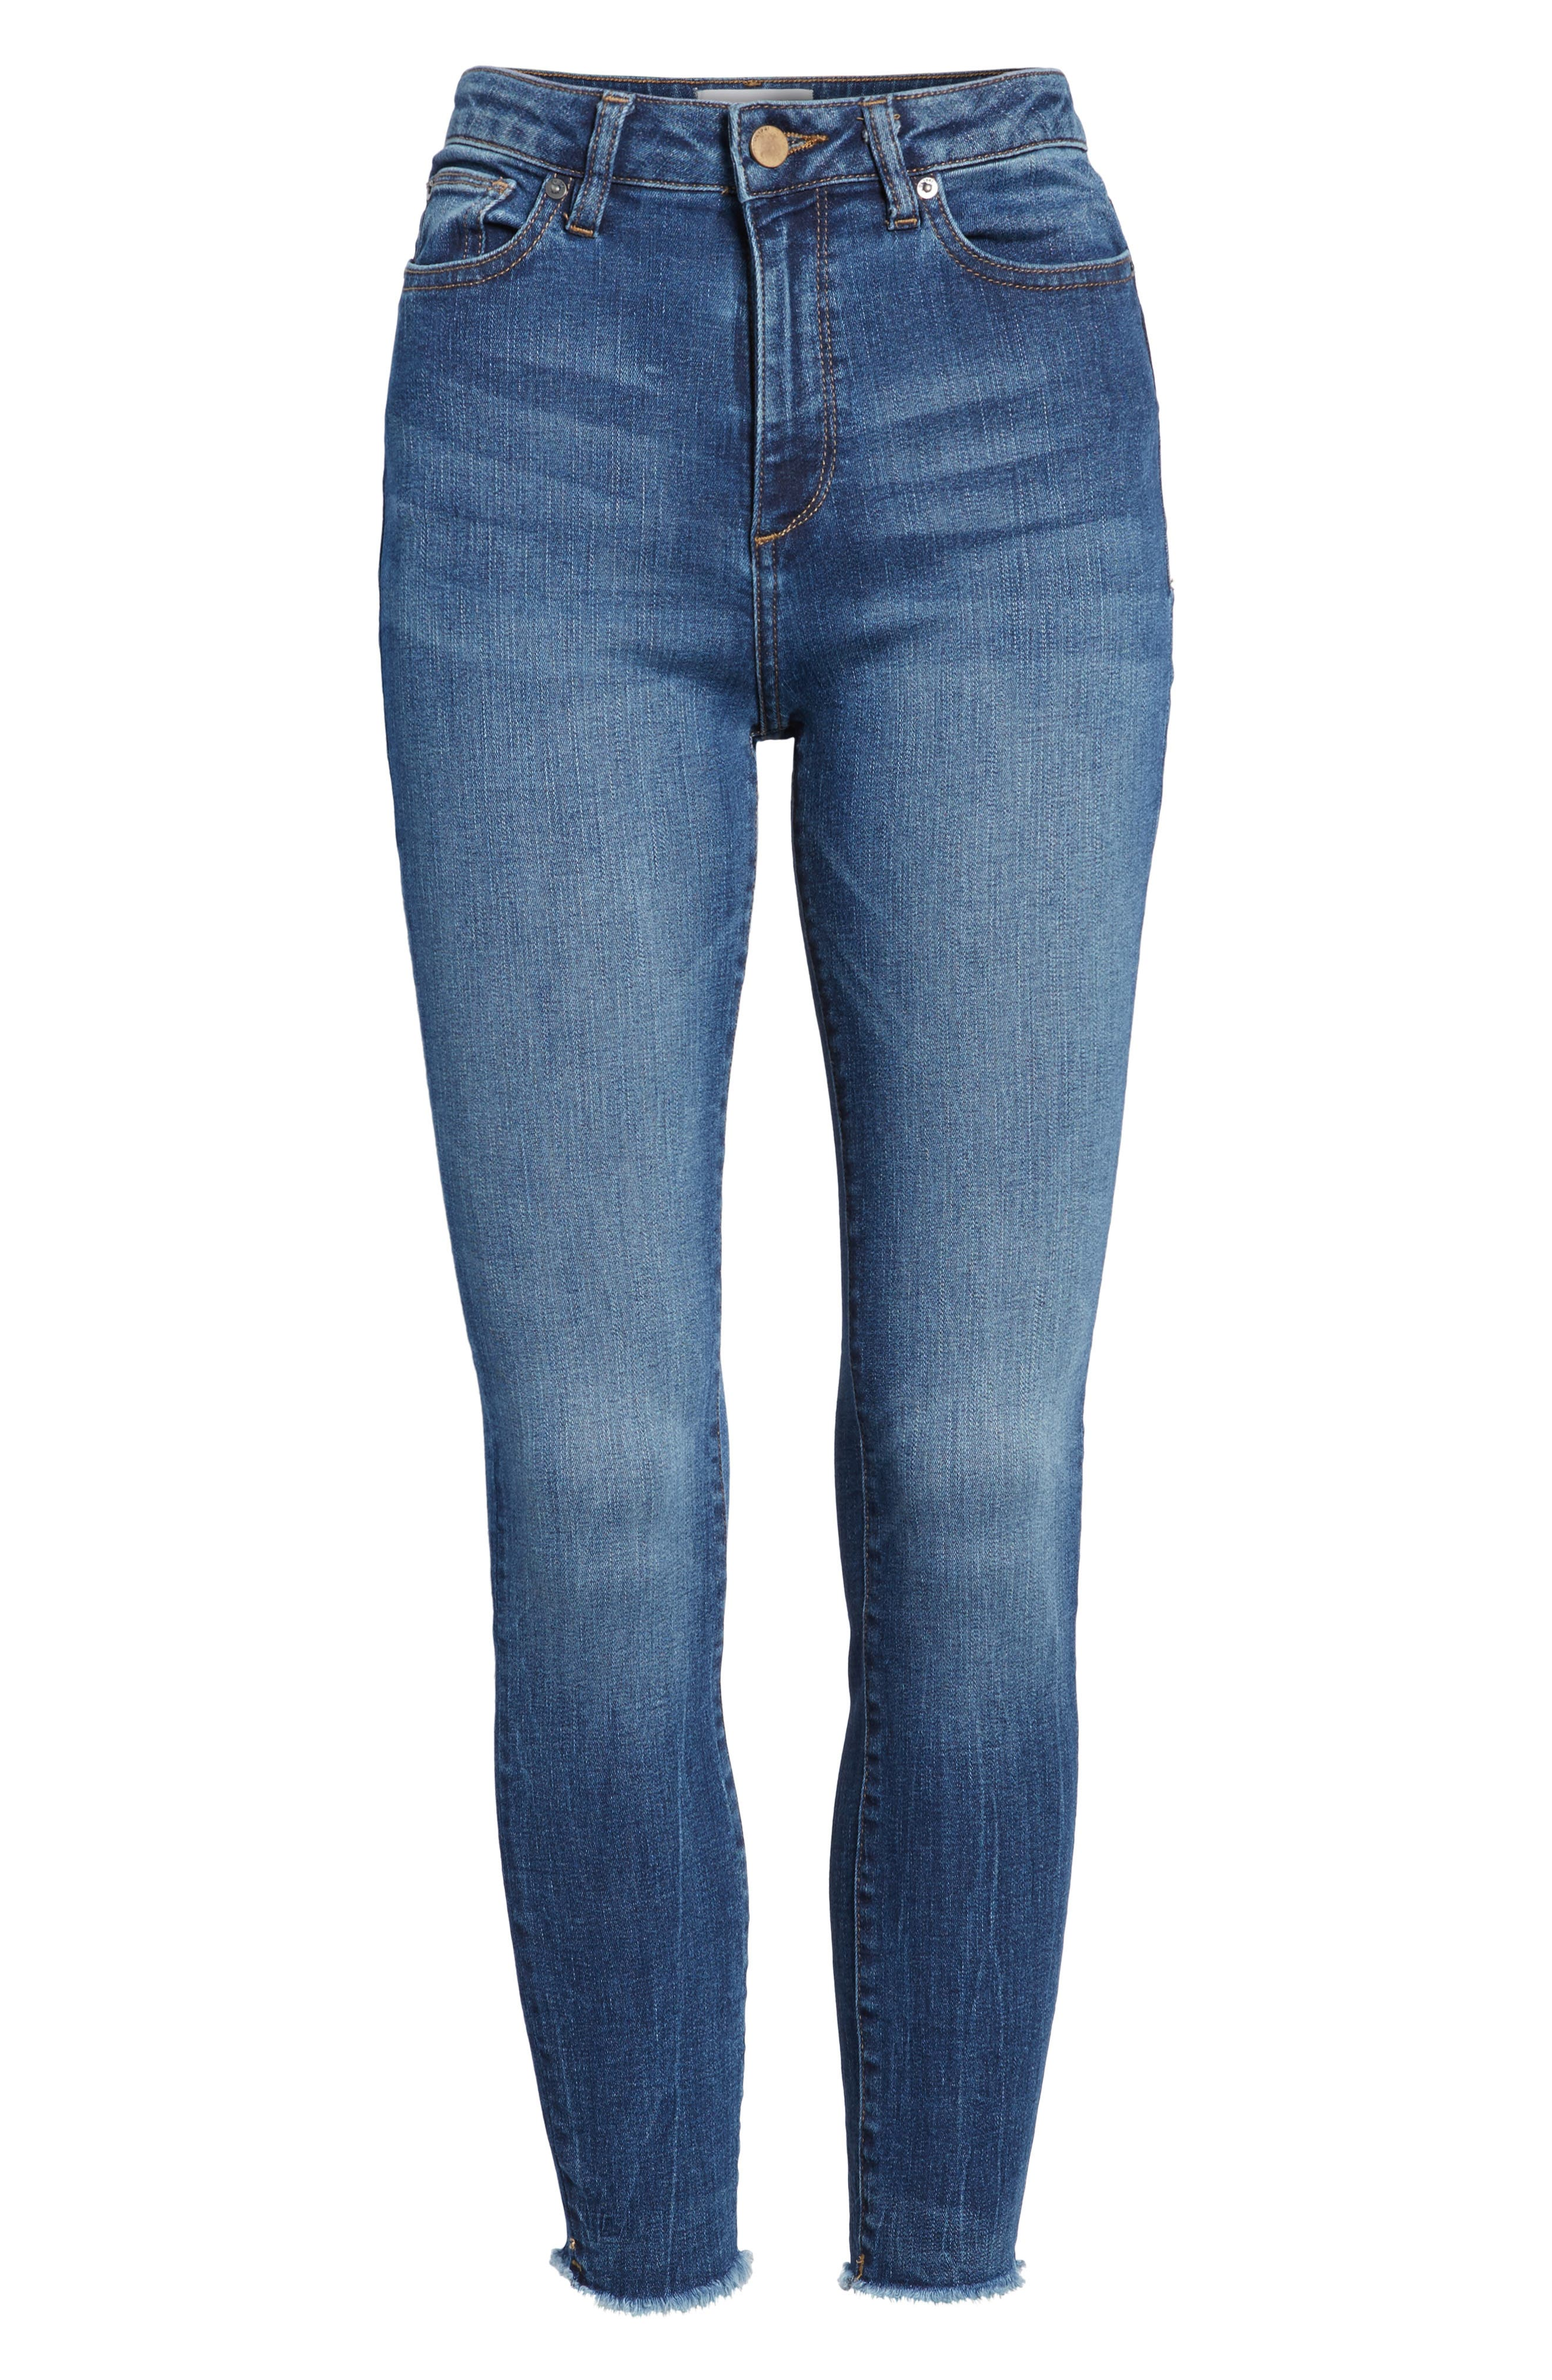 Chrissy Trimtone High Waist Skinny Jeans,                             Alternate thumbnail 6, color,                             Bal Harbour